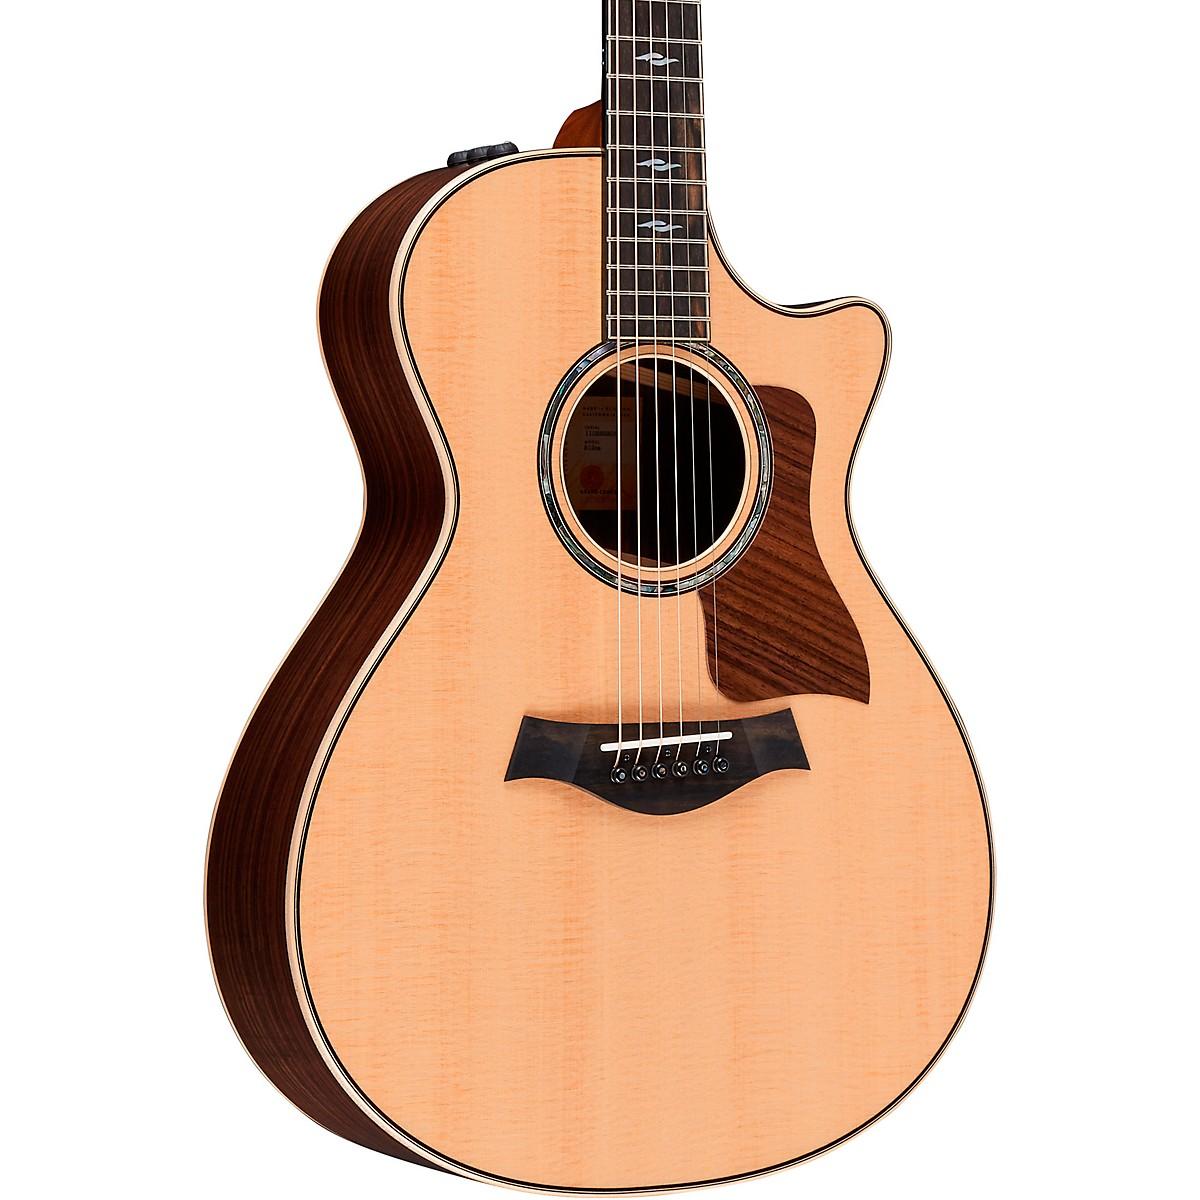 Taylor 812ce Grand Concert V-Class Acoustic-Electric Guitar